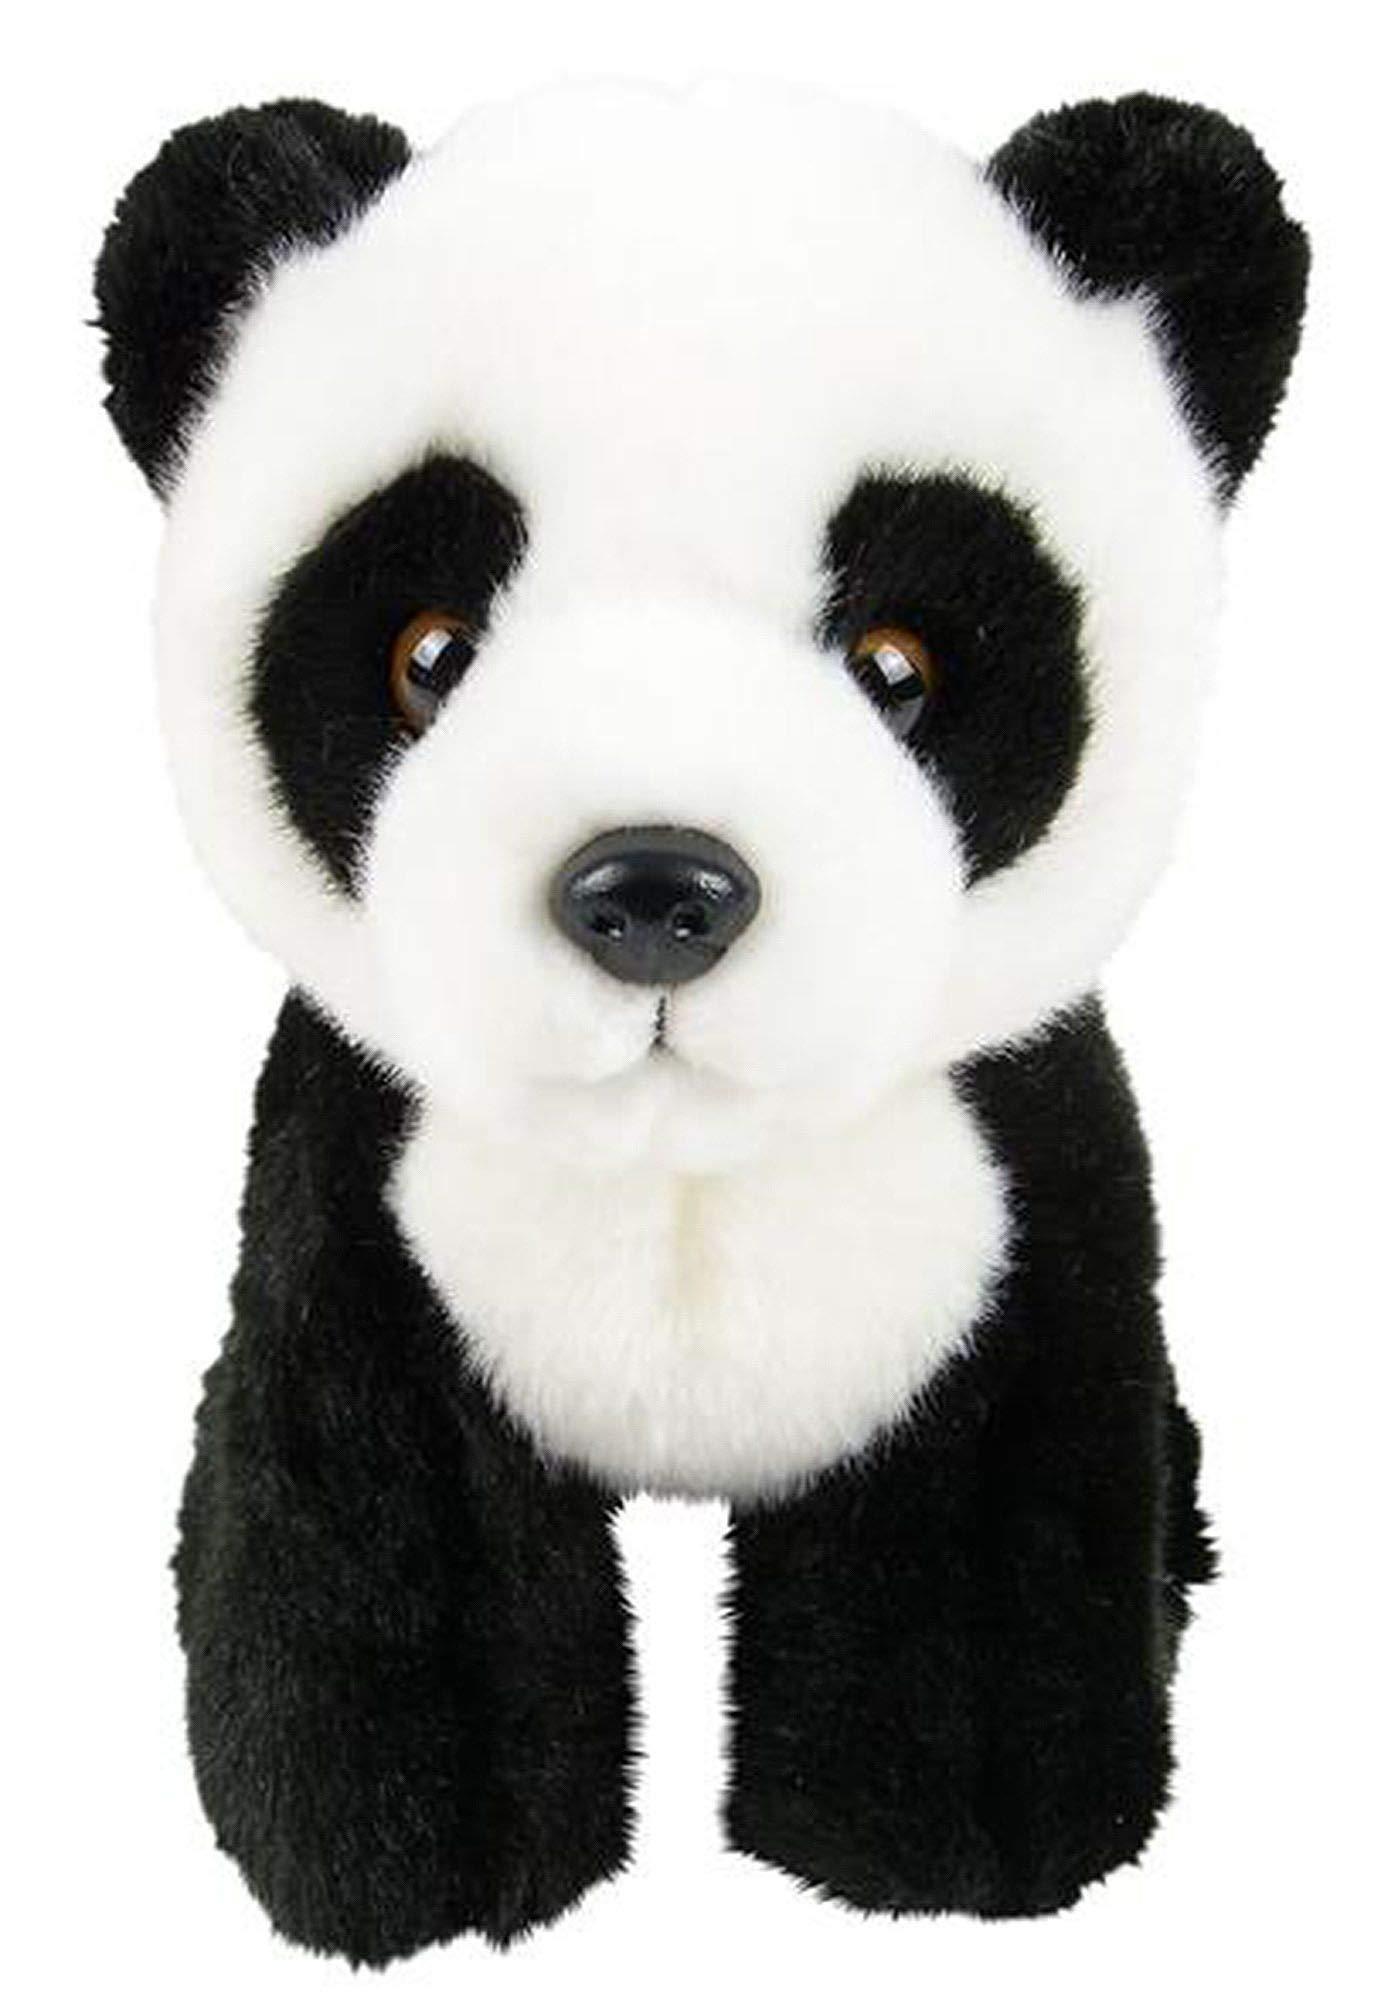 Wildlife Tree 7 Inch Stuffed Panda Bear Plush Sitting Animal Kingdom Collection